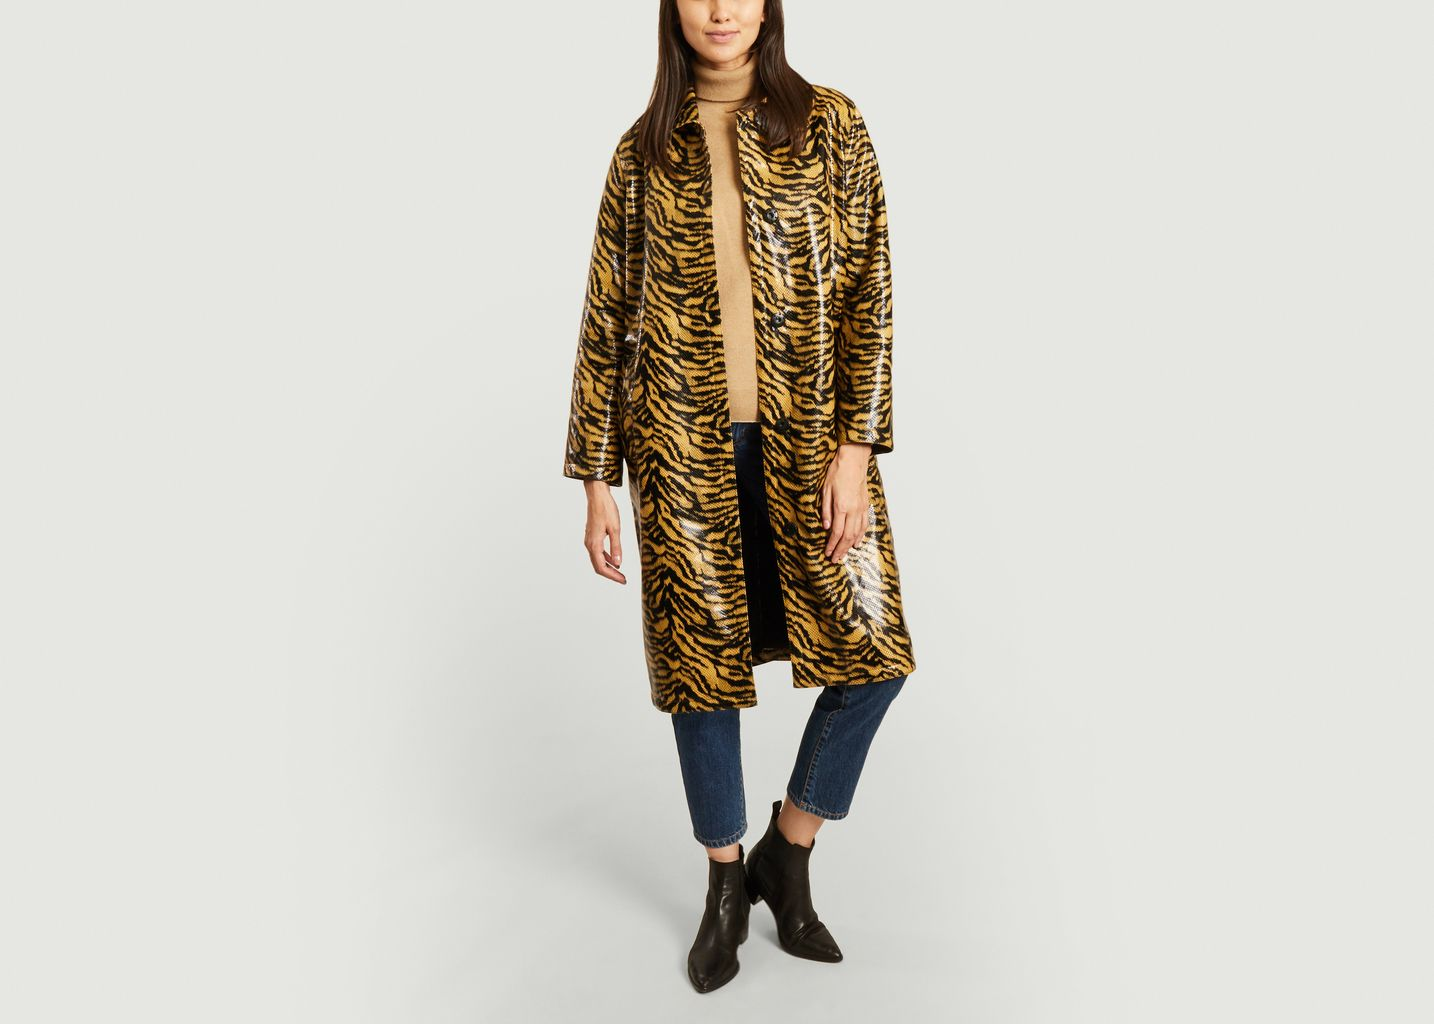 Manteau effet cuir motif zébré Elyssa - Stand Studio